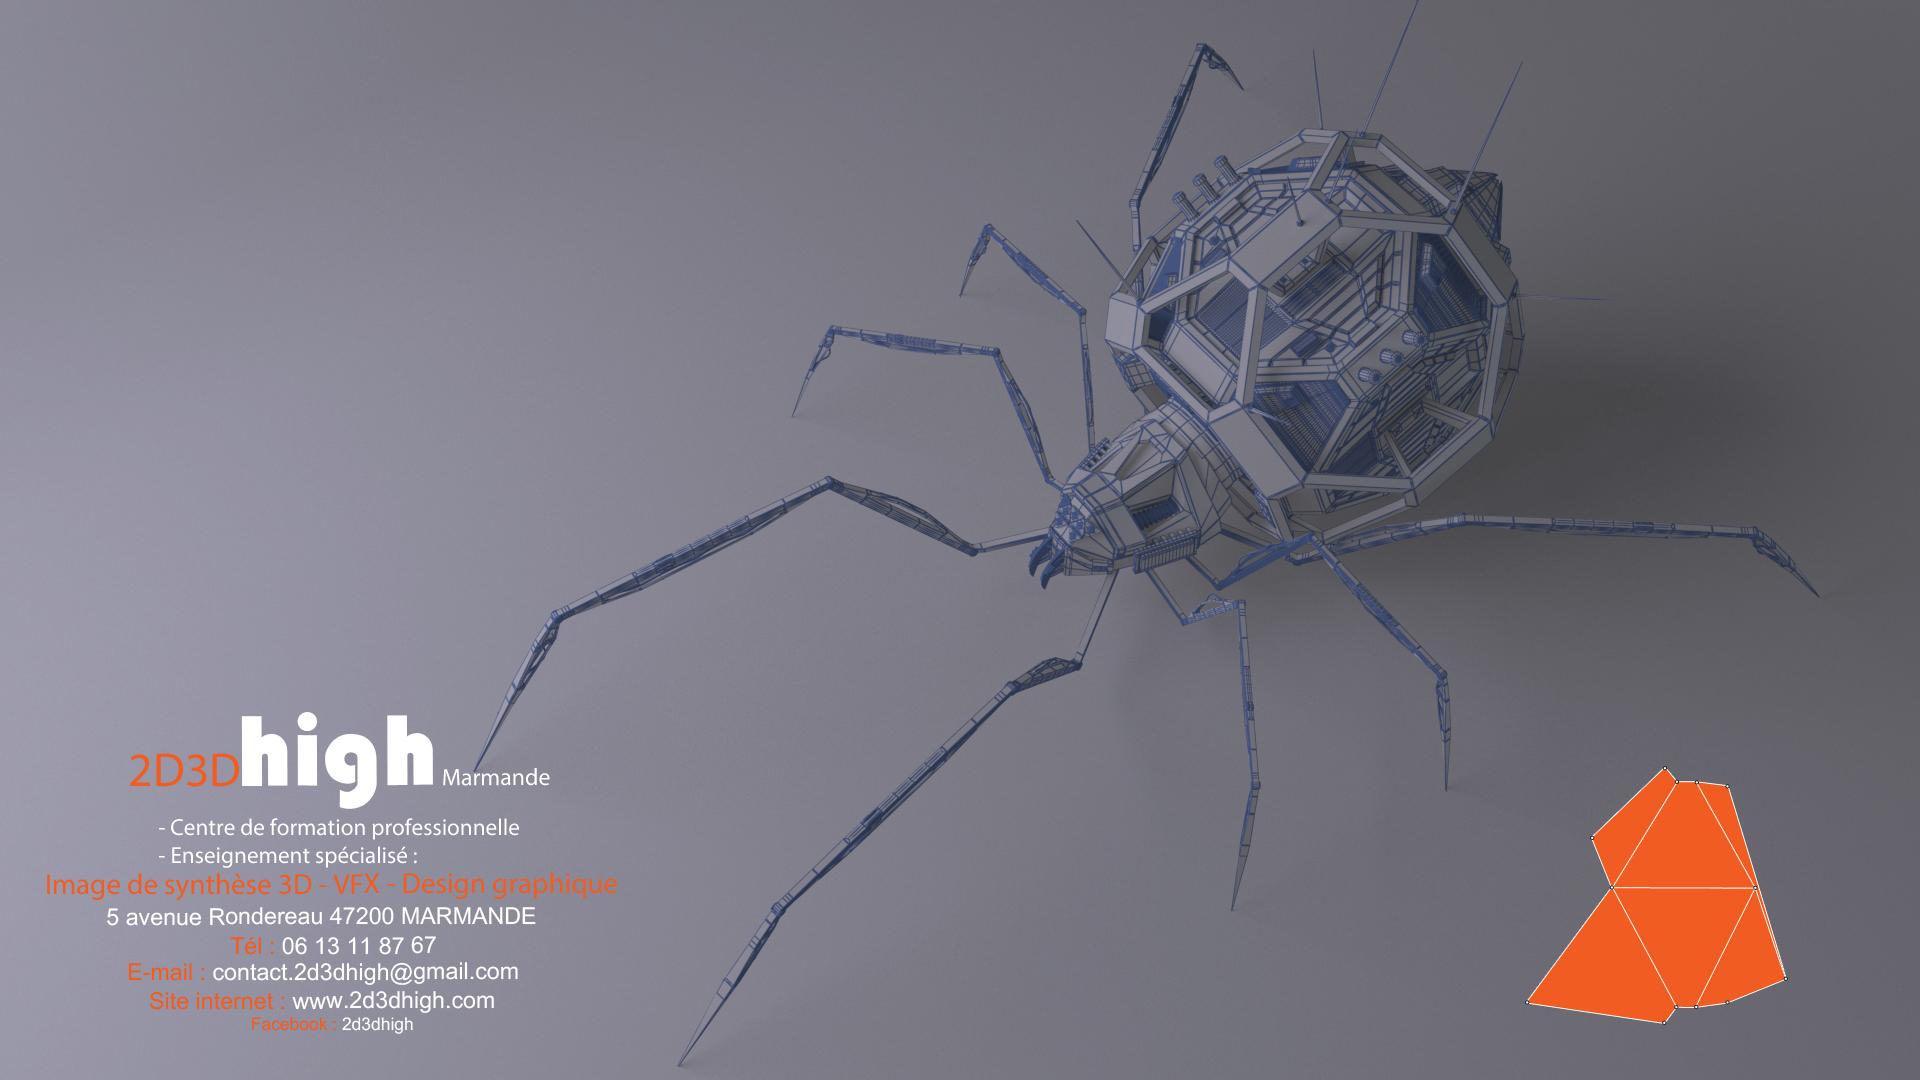 mecha spider wireframe